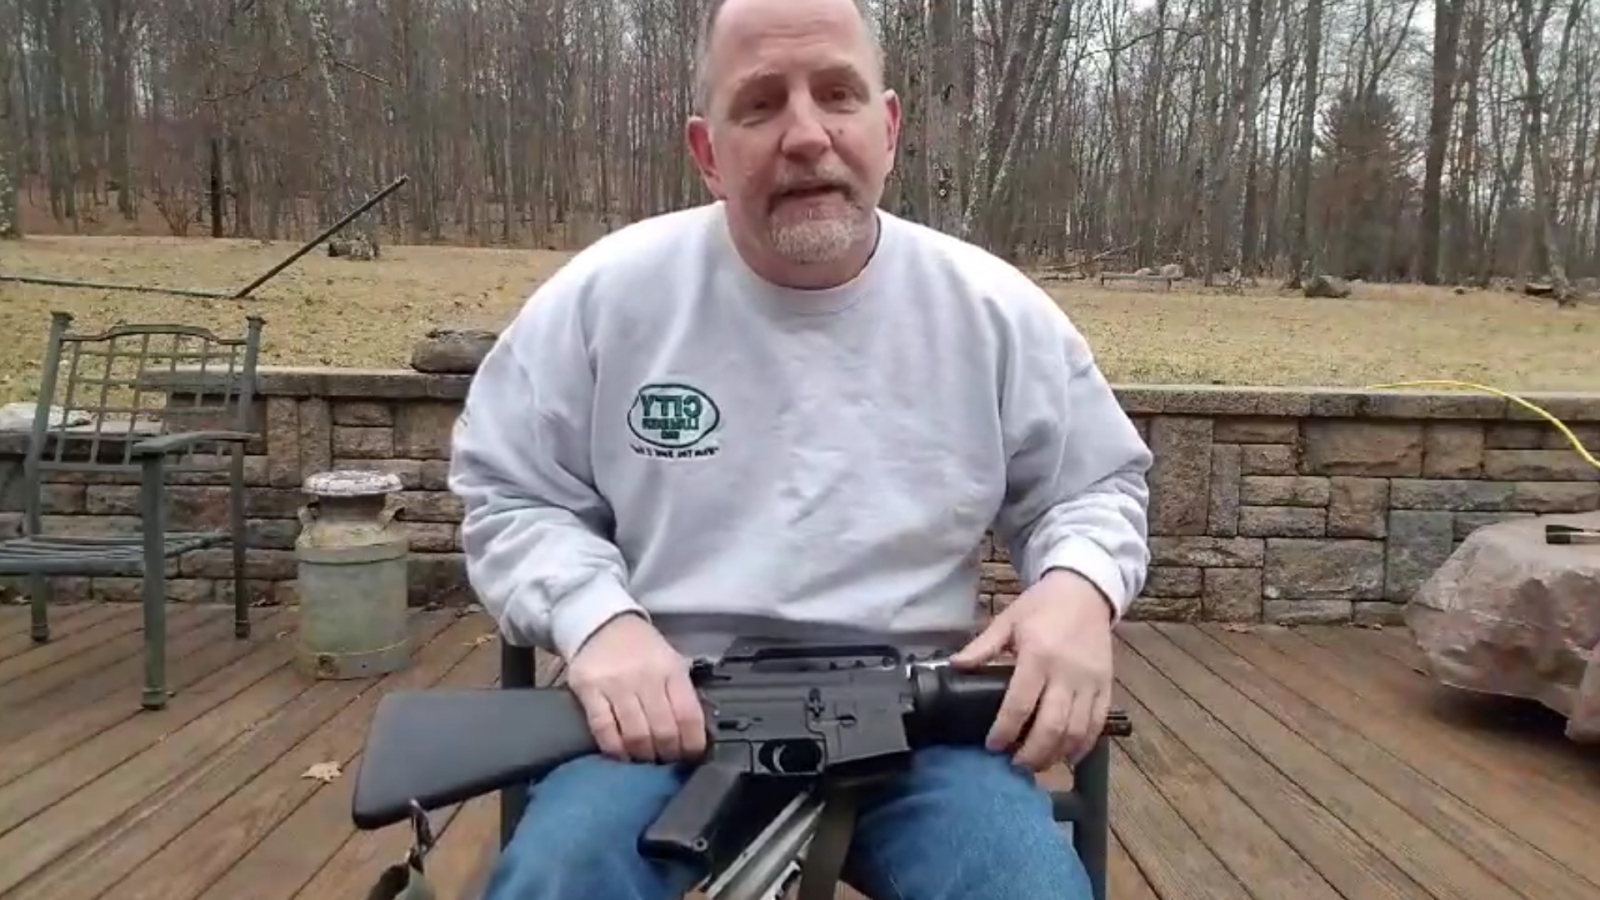 gun-owner-with-2nd-amendment-tattoo-deliberately-breaks-his-gun